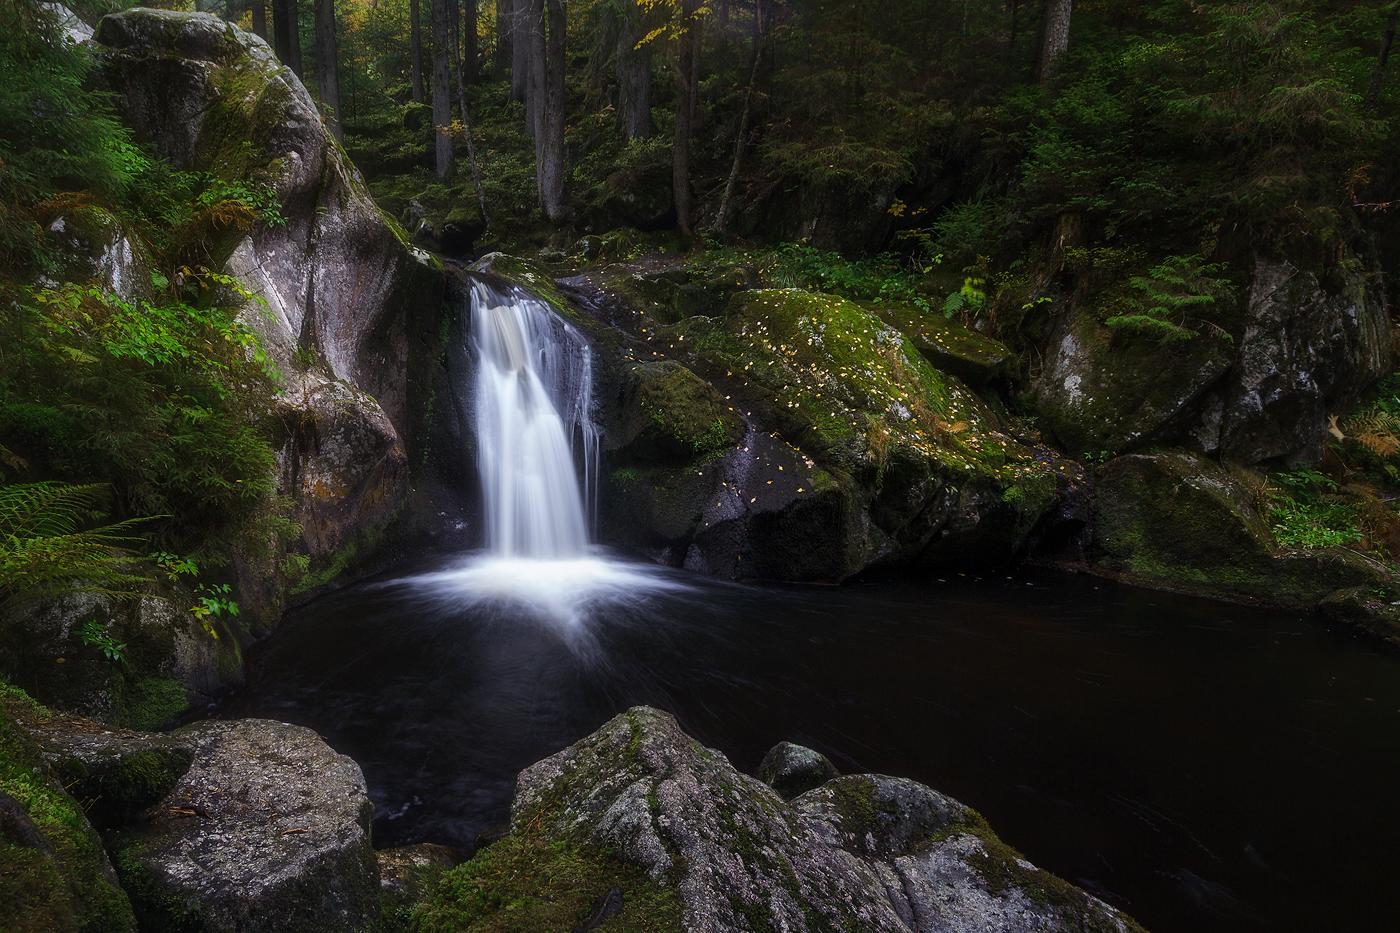 Krai Woog Gumpen, Black Forest, Germany